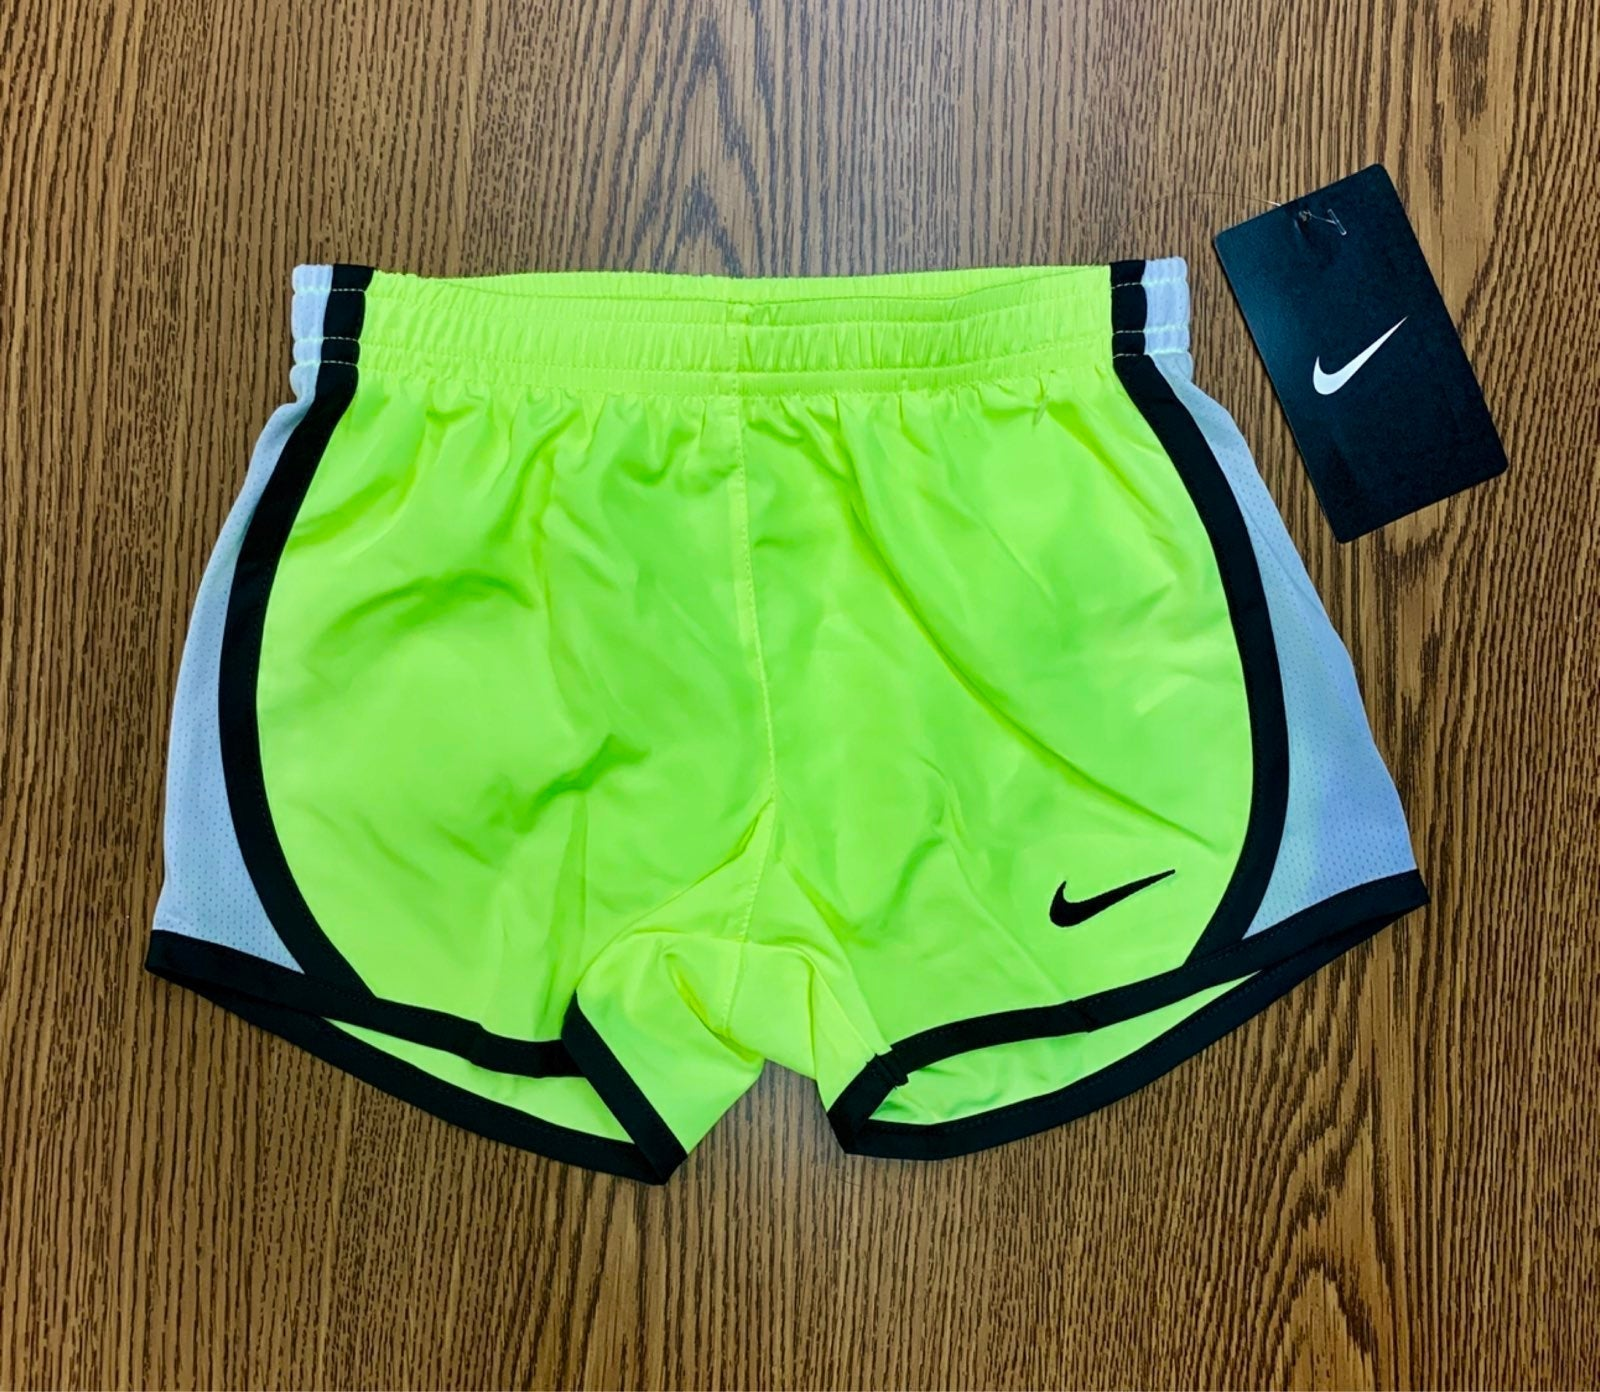 Nike Dri-Fit Girls Shorts Sz 4 NWT